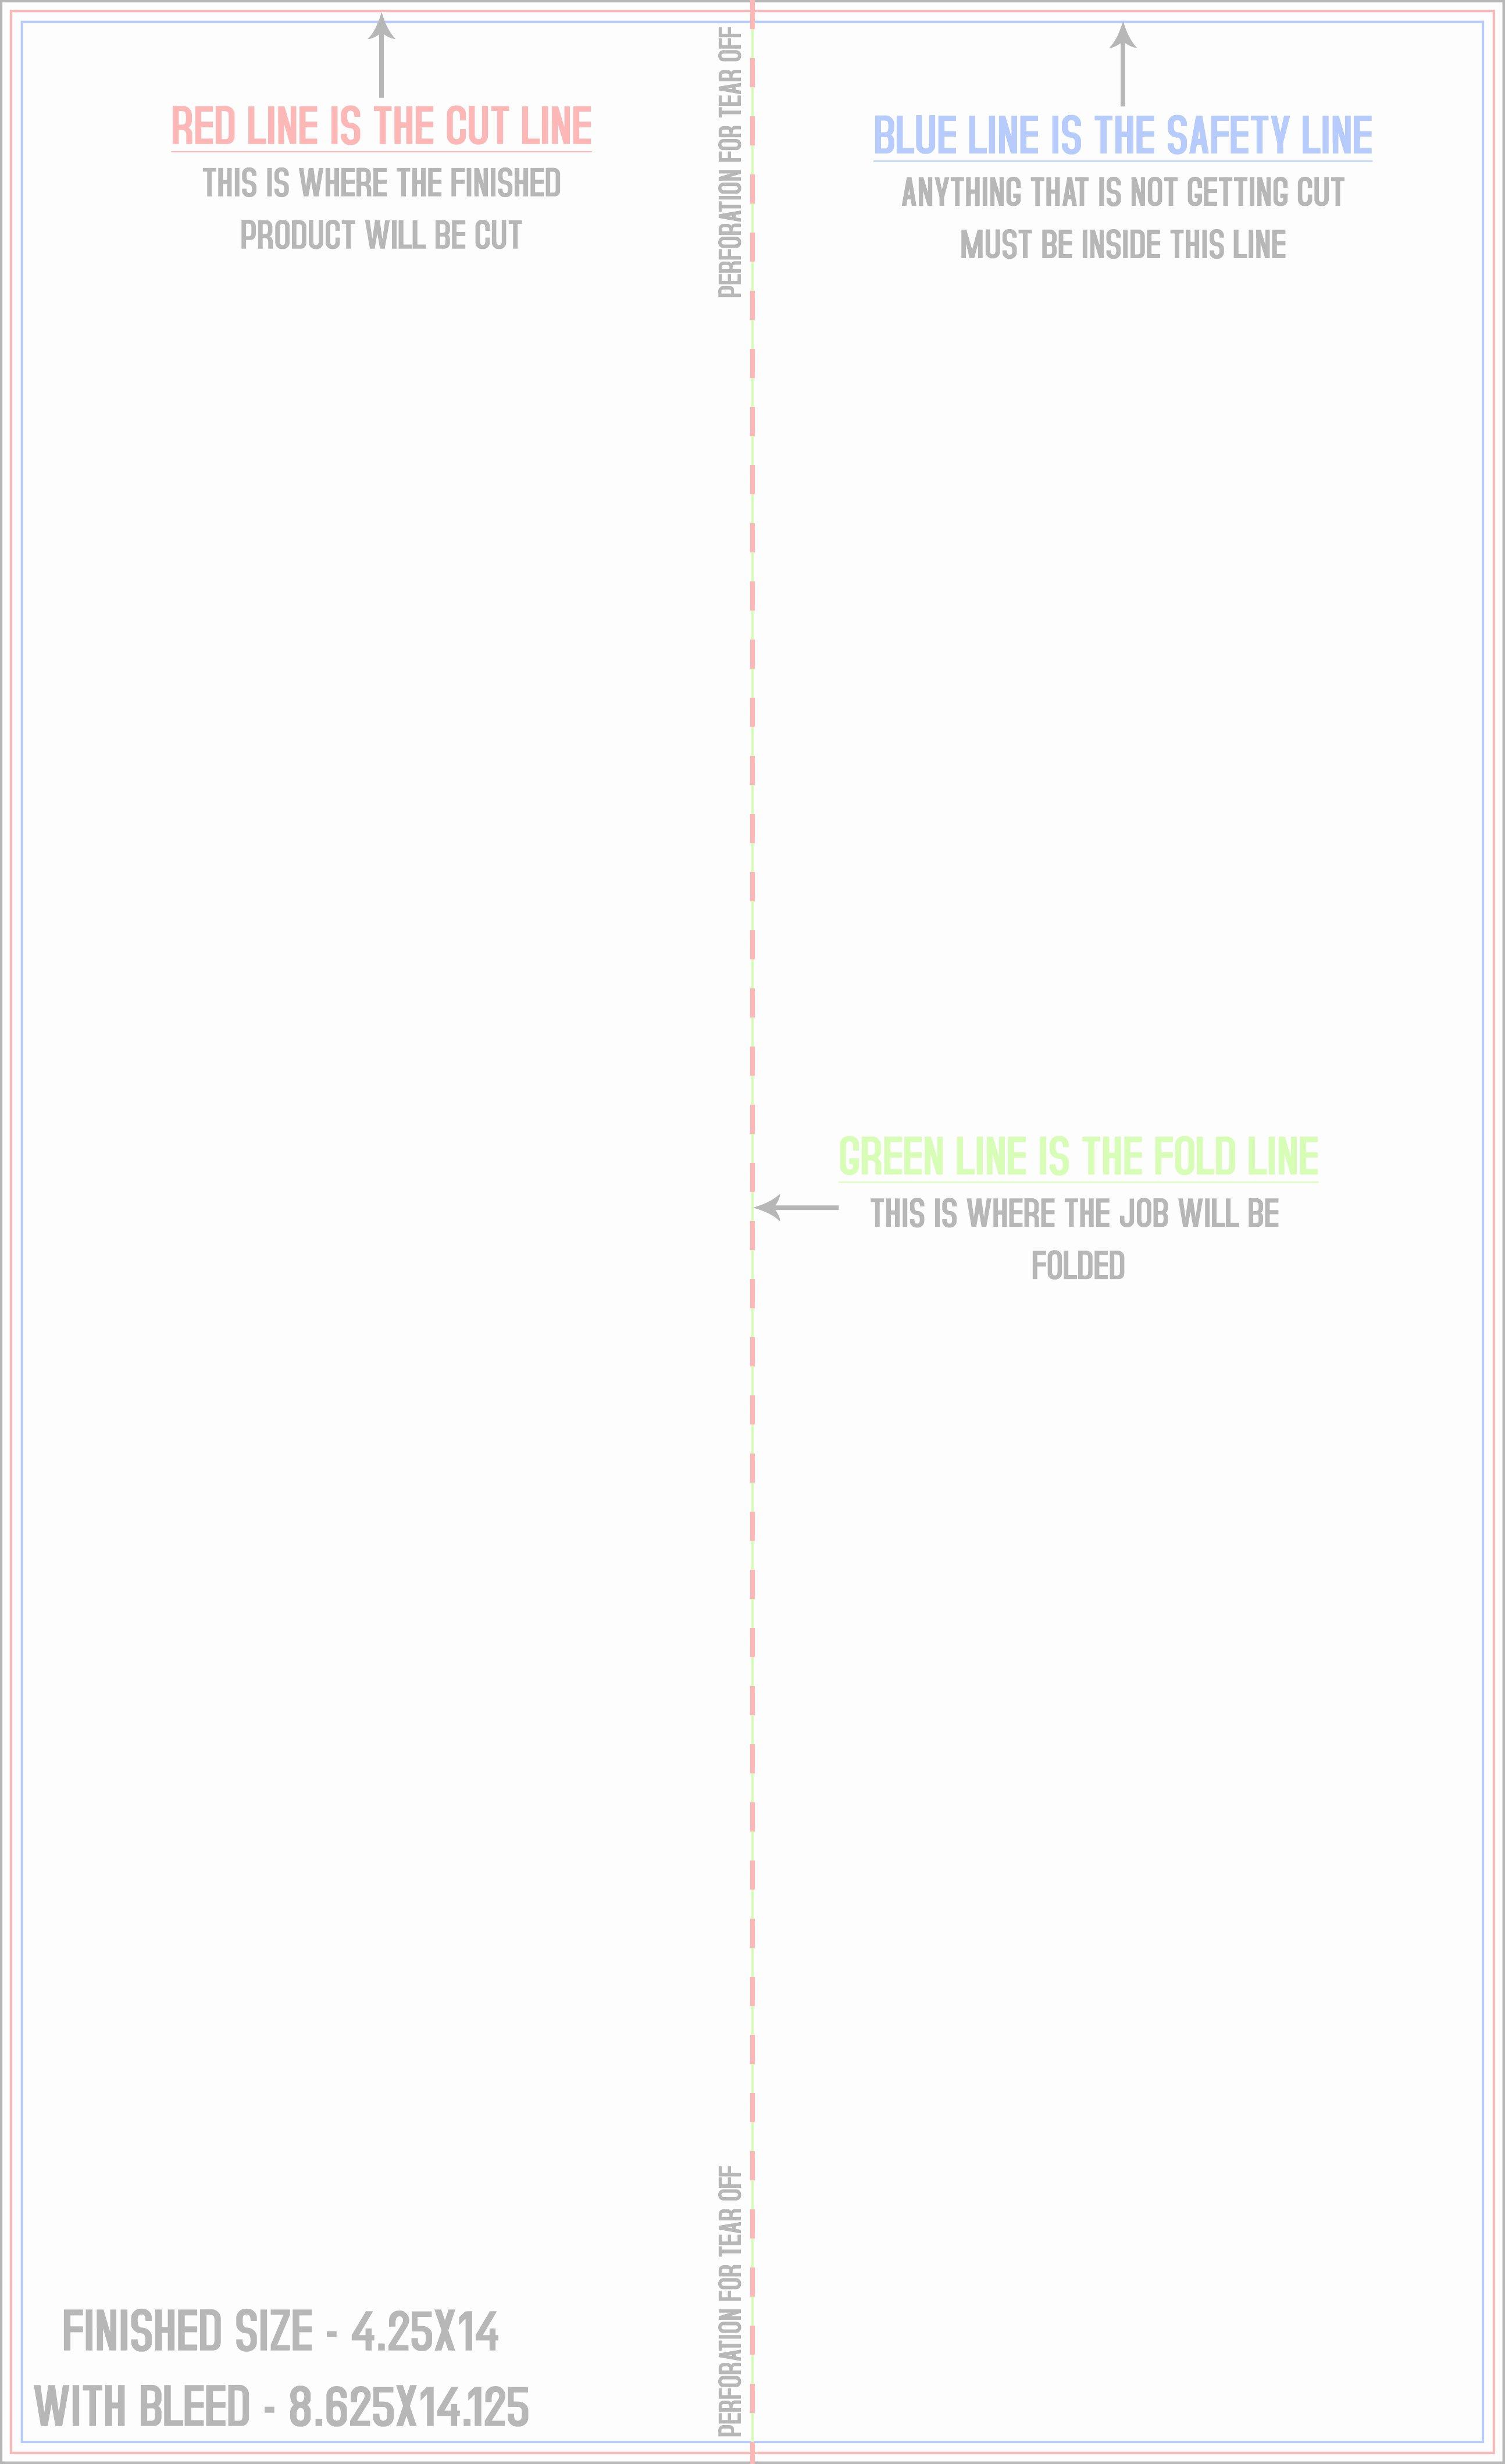 Half Fold Brochure Template Inspirational Brochure Half Fold & Perf On Fold Templates